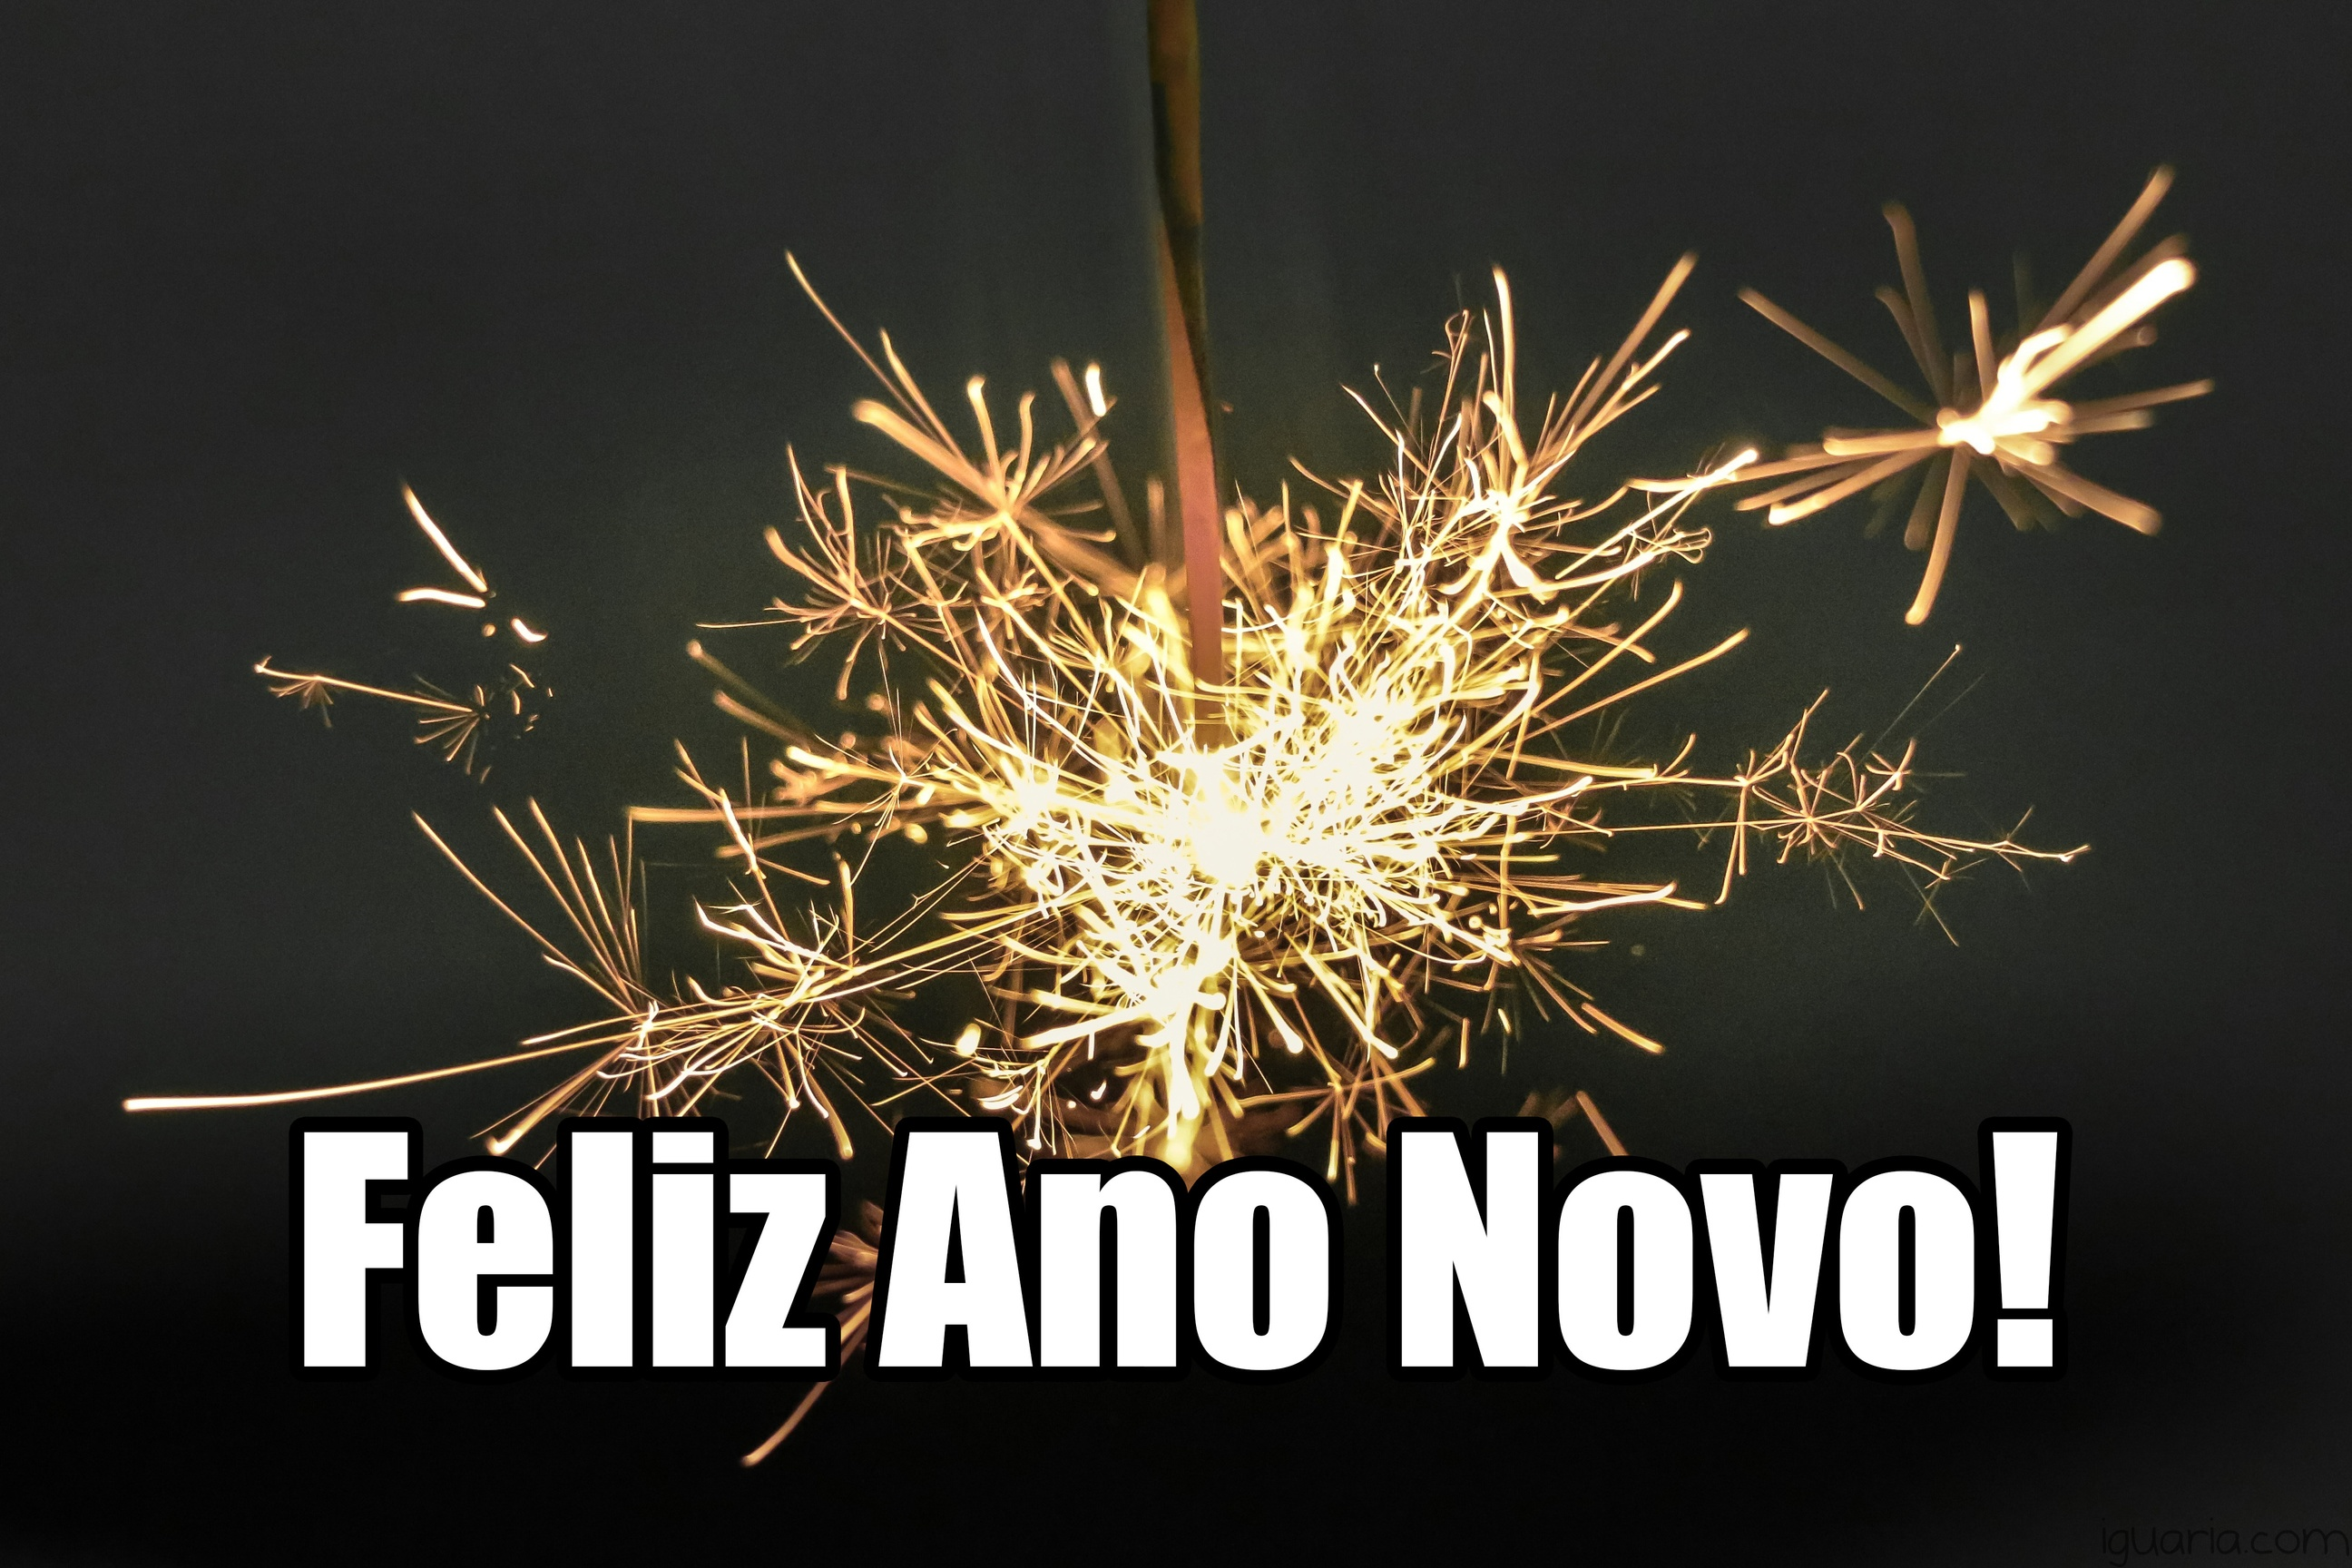 iguaria-feliz-ano-novo-2016-2017